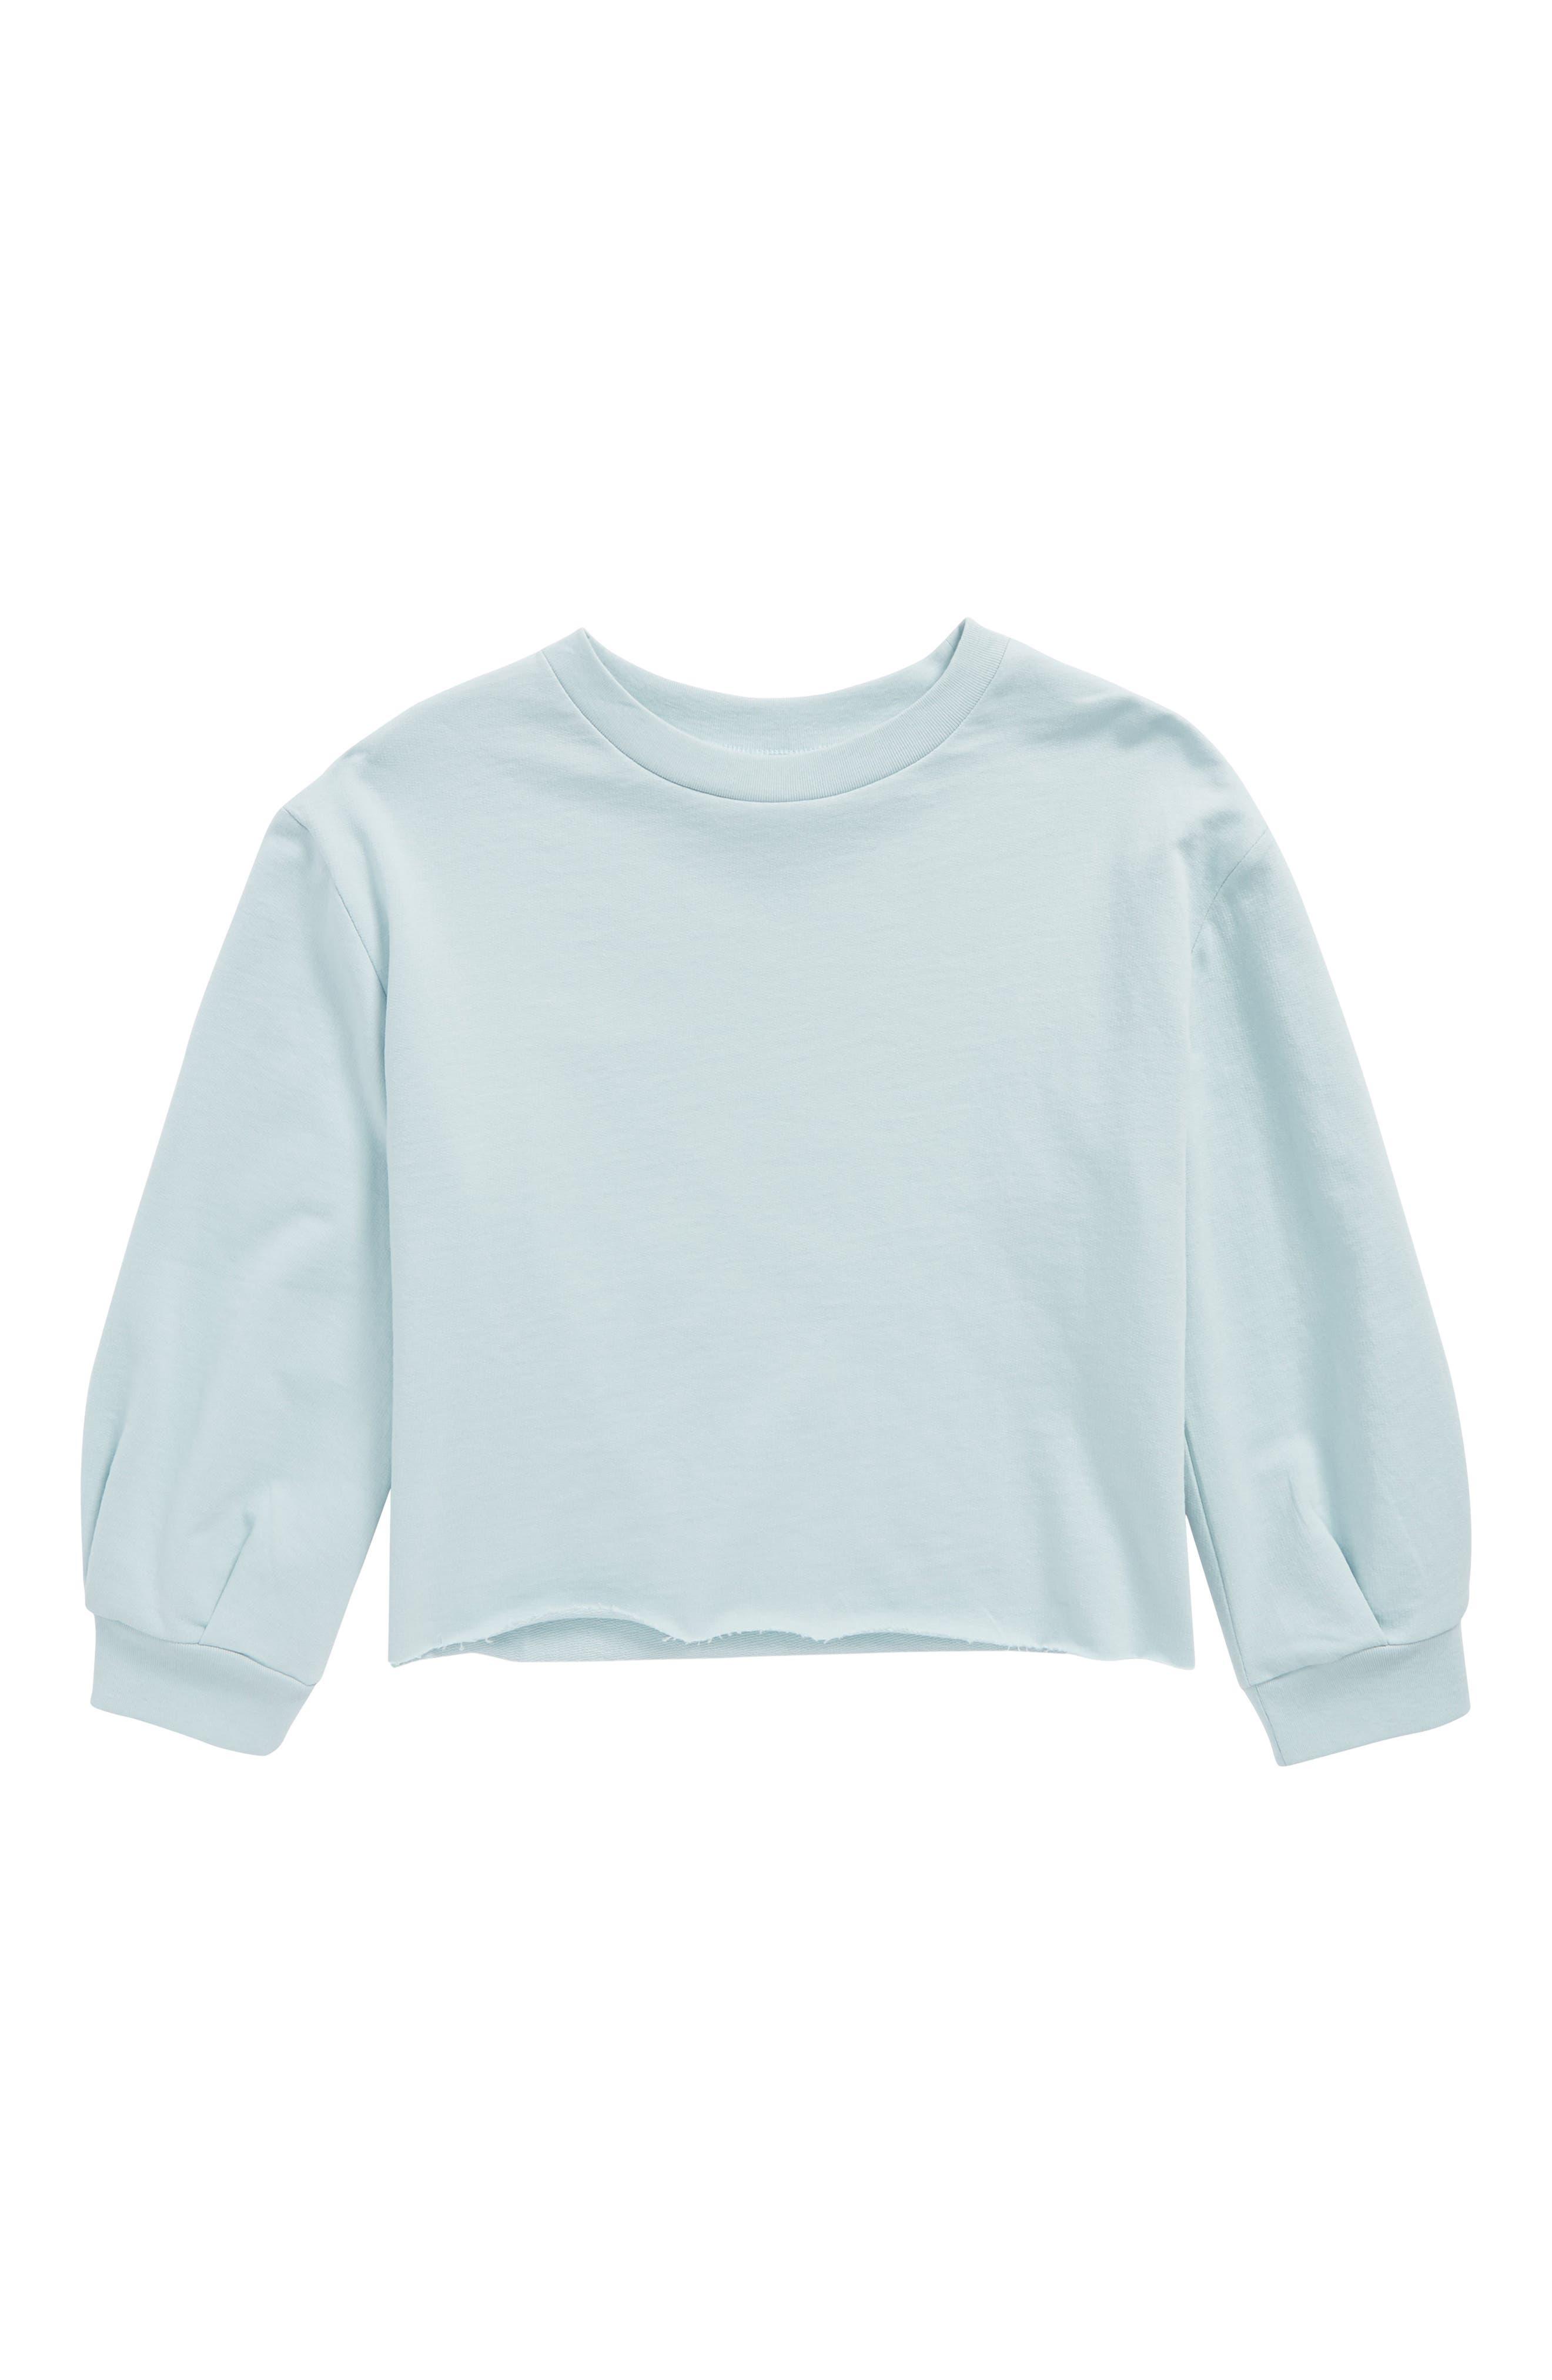 Raw Edge Sweatshirt,                         Main,                         color, Blue Sterling